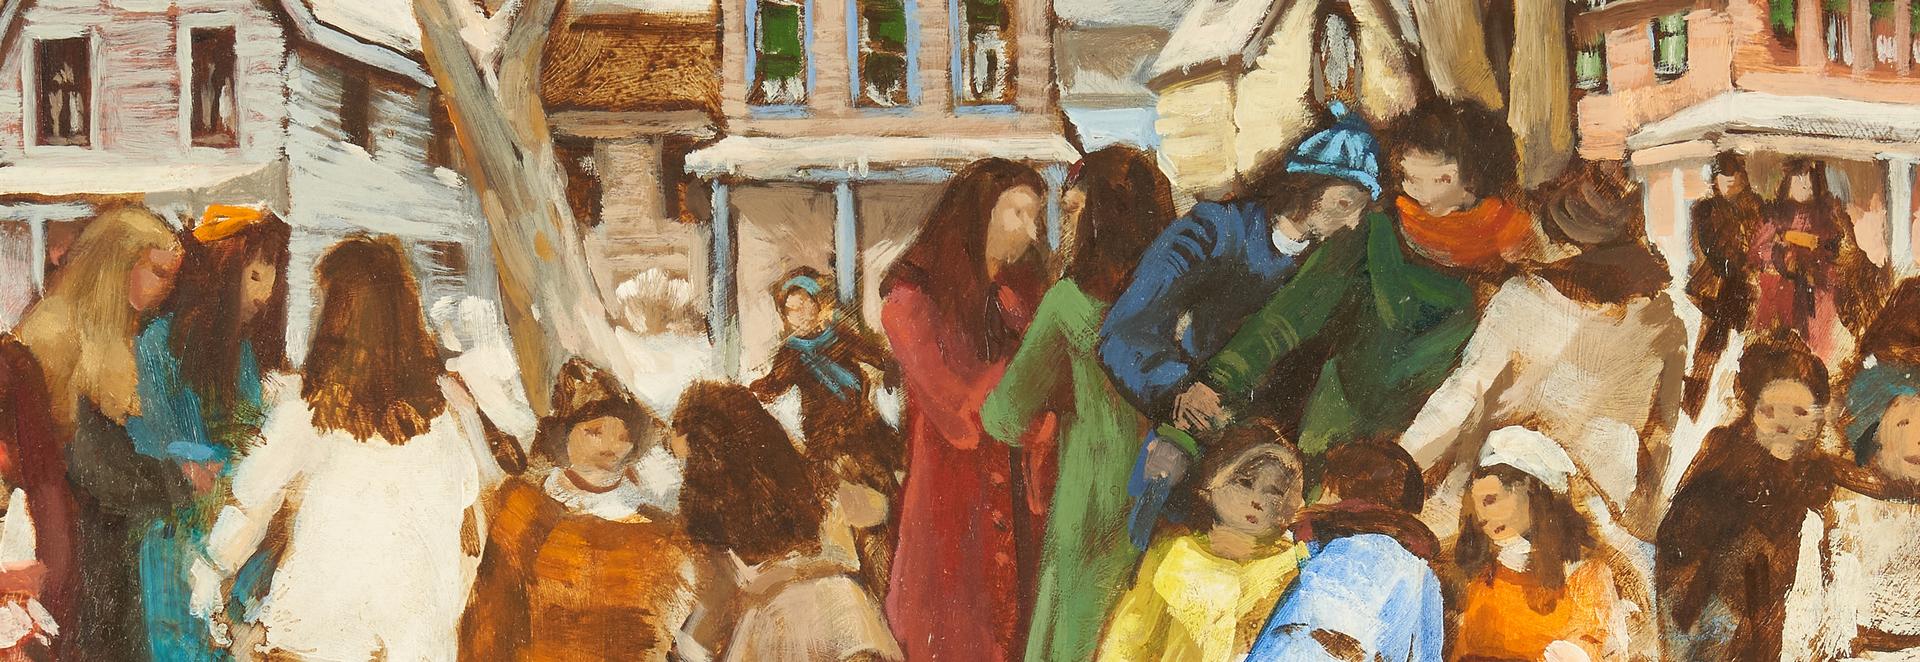 Lot 970: Carl Zimmerman O/B, School Children on a Winter Day